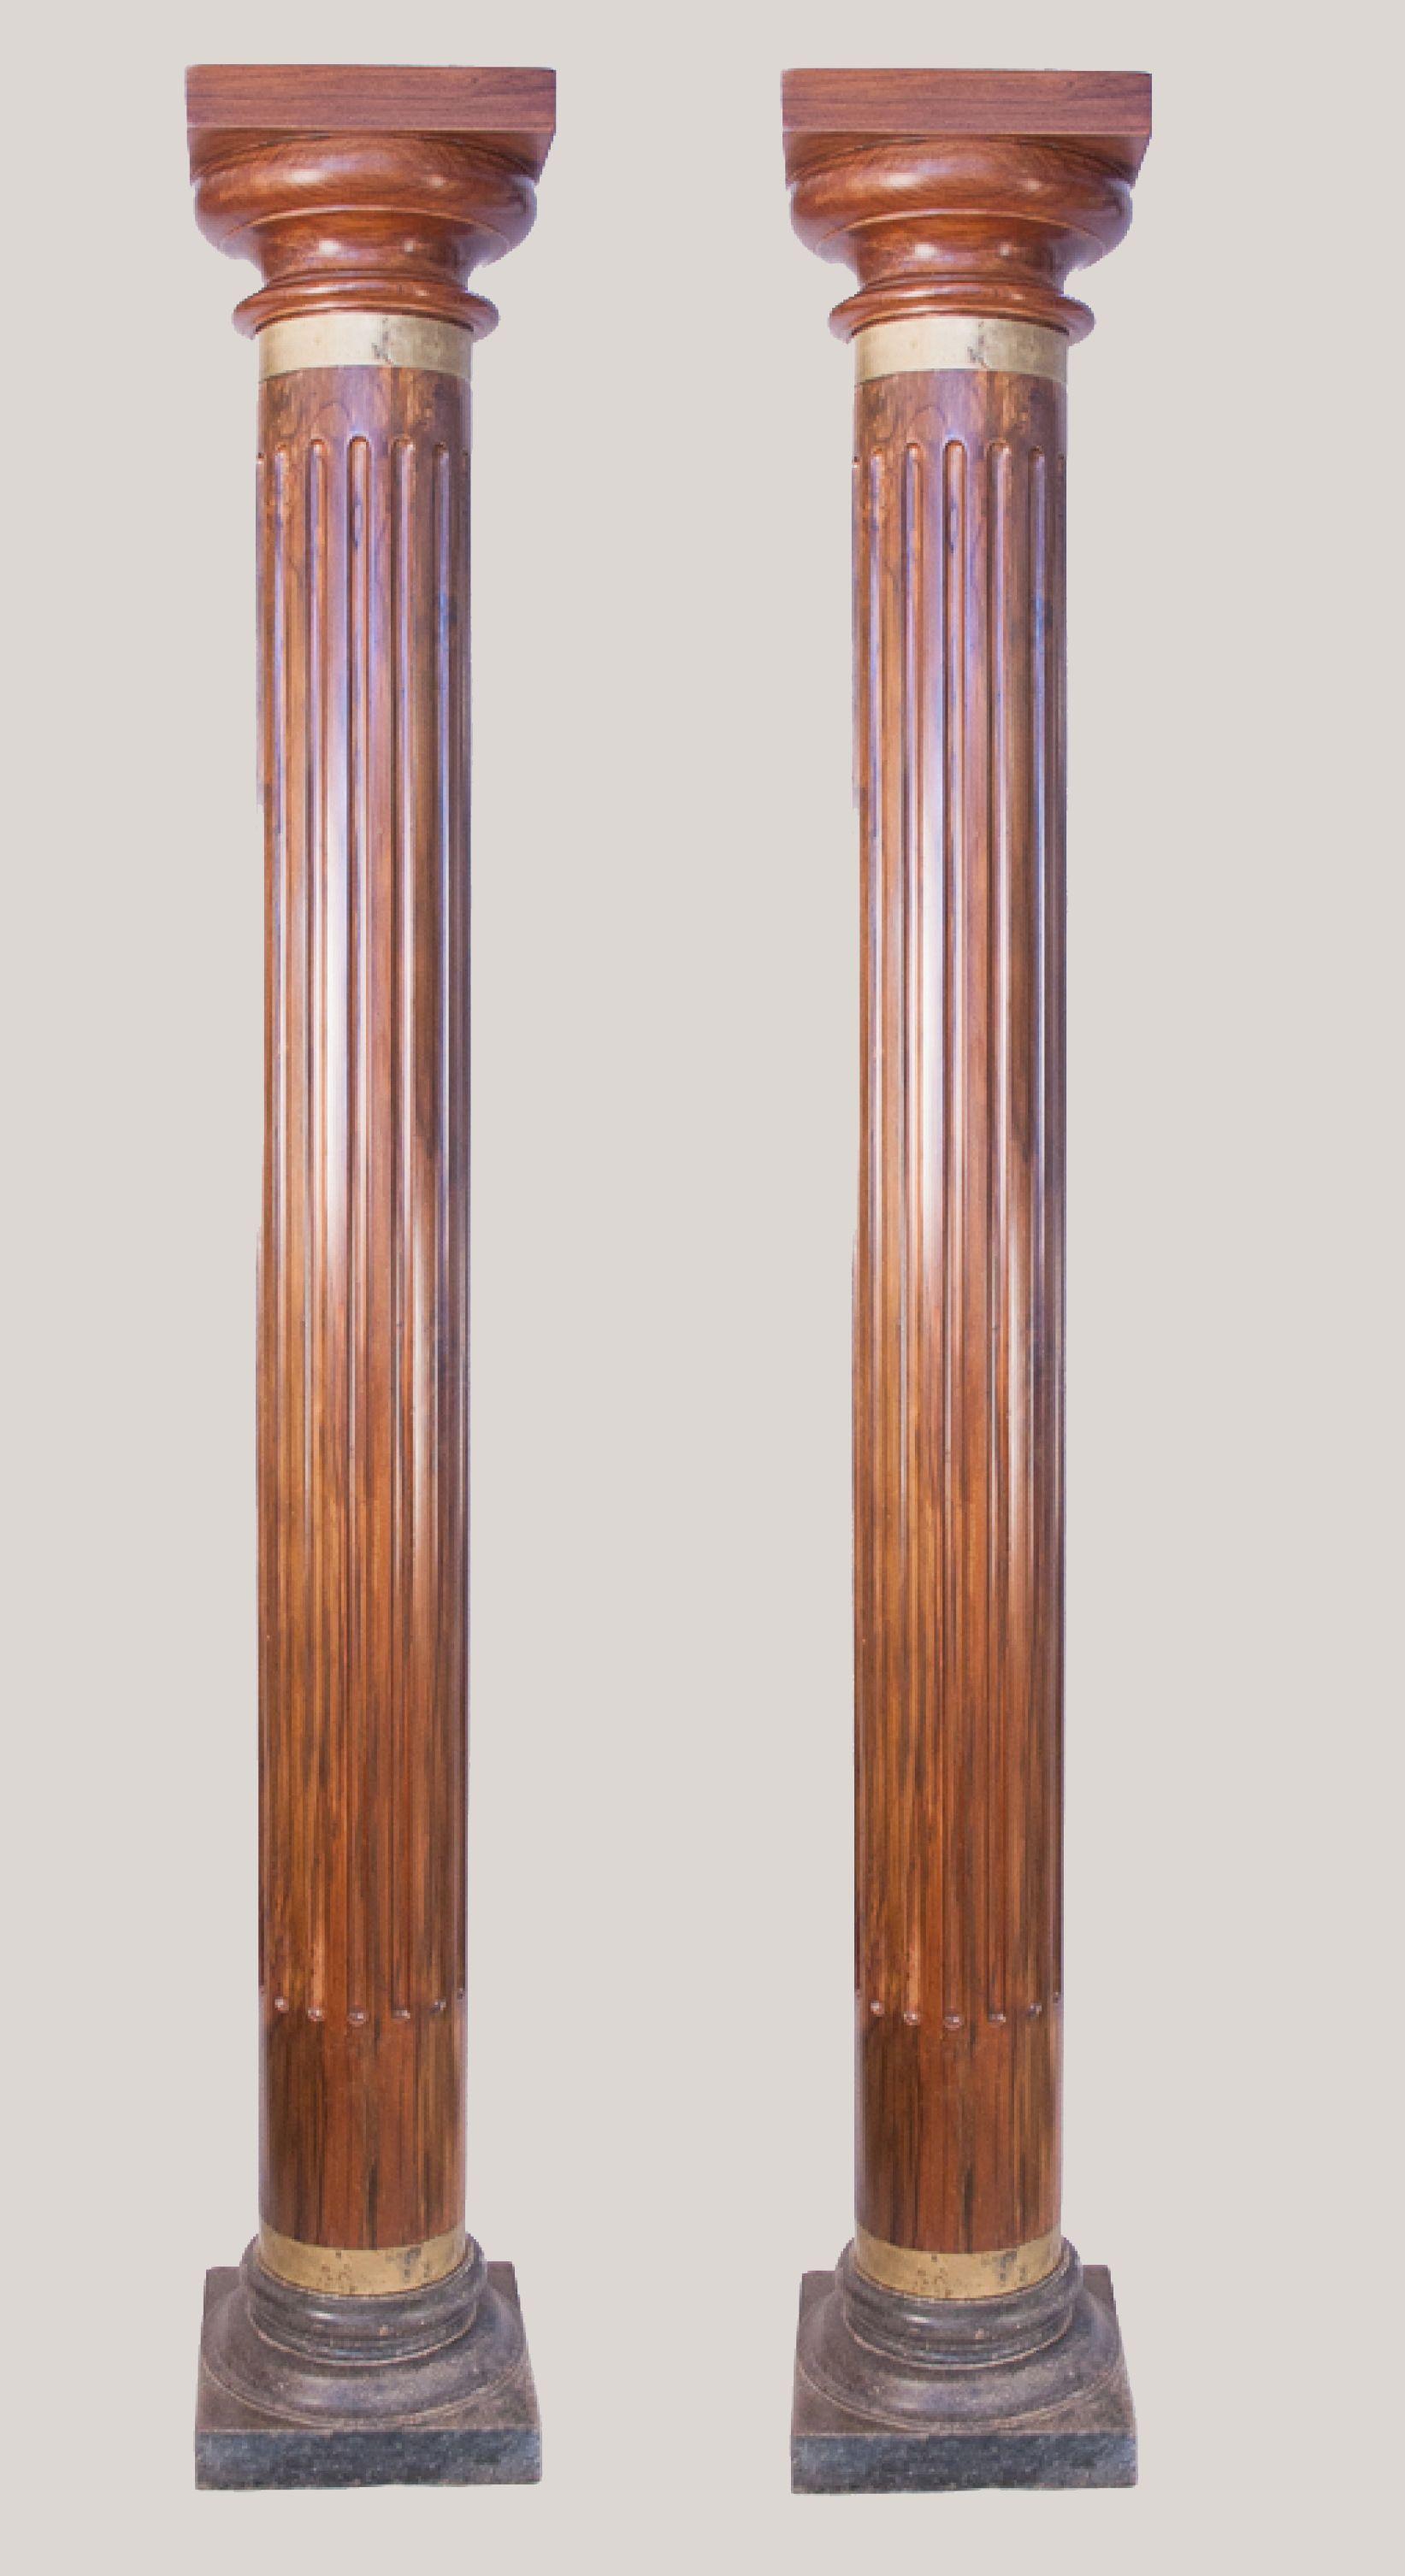 Antique Wood Reeded Doric Columns Or Pillars Fair Trade